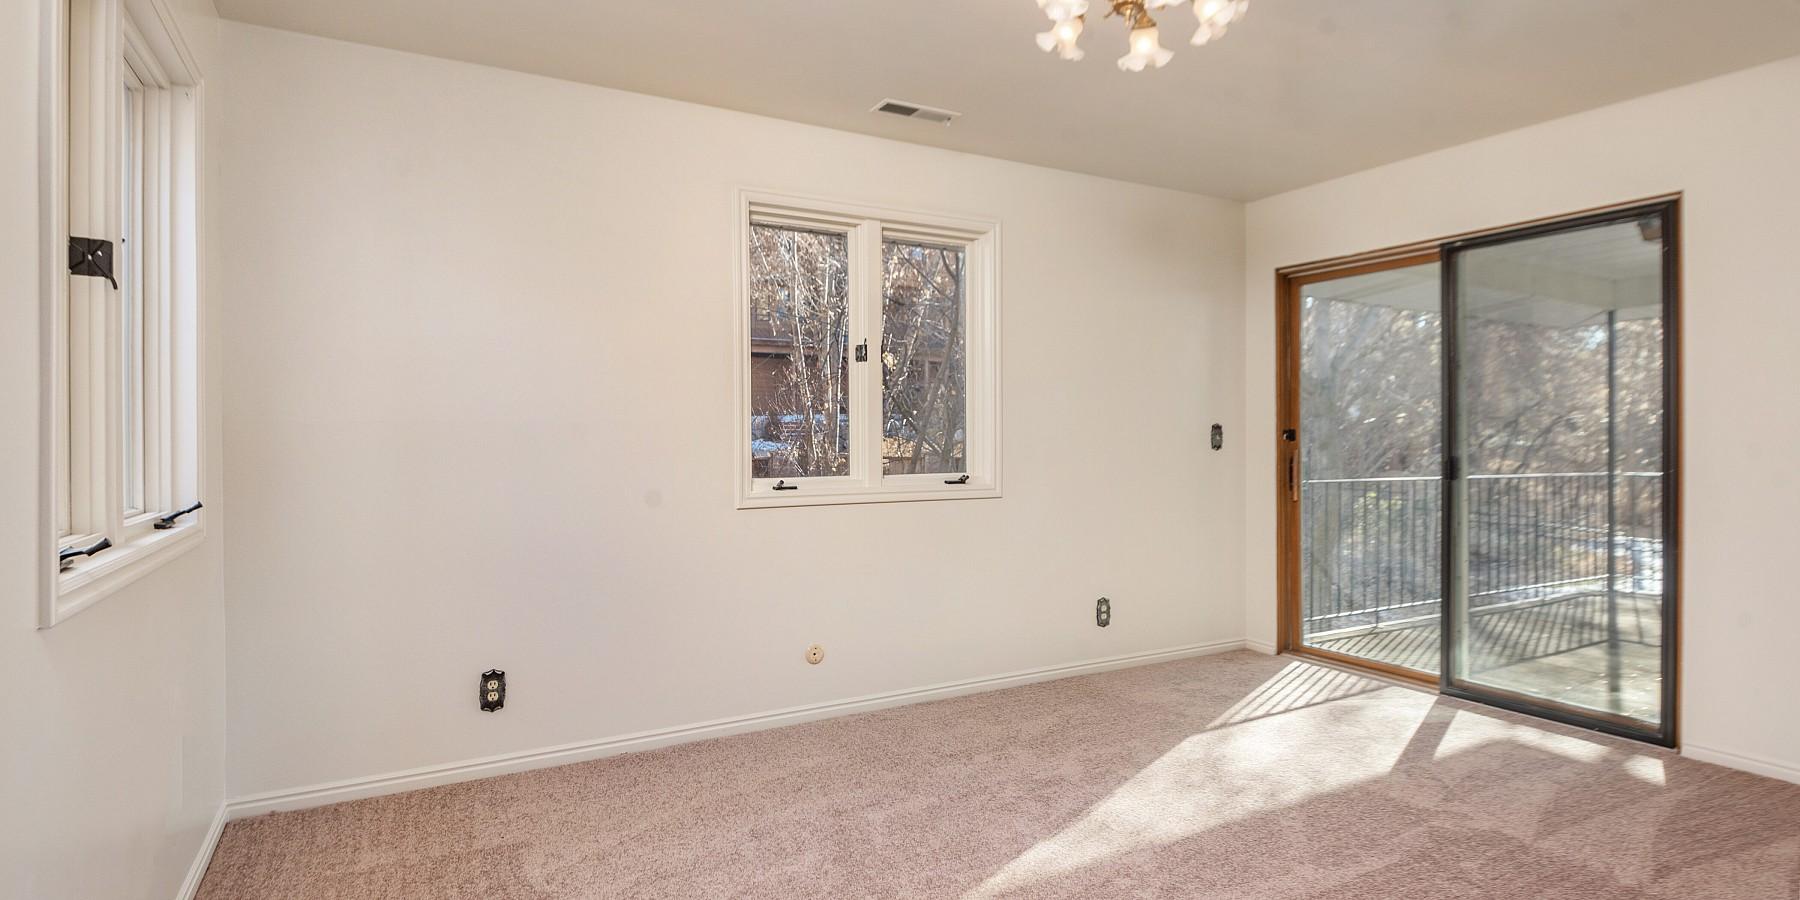 7355 S. Comstock Circle, Cottonwood Heights, UT 84121